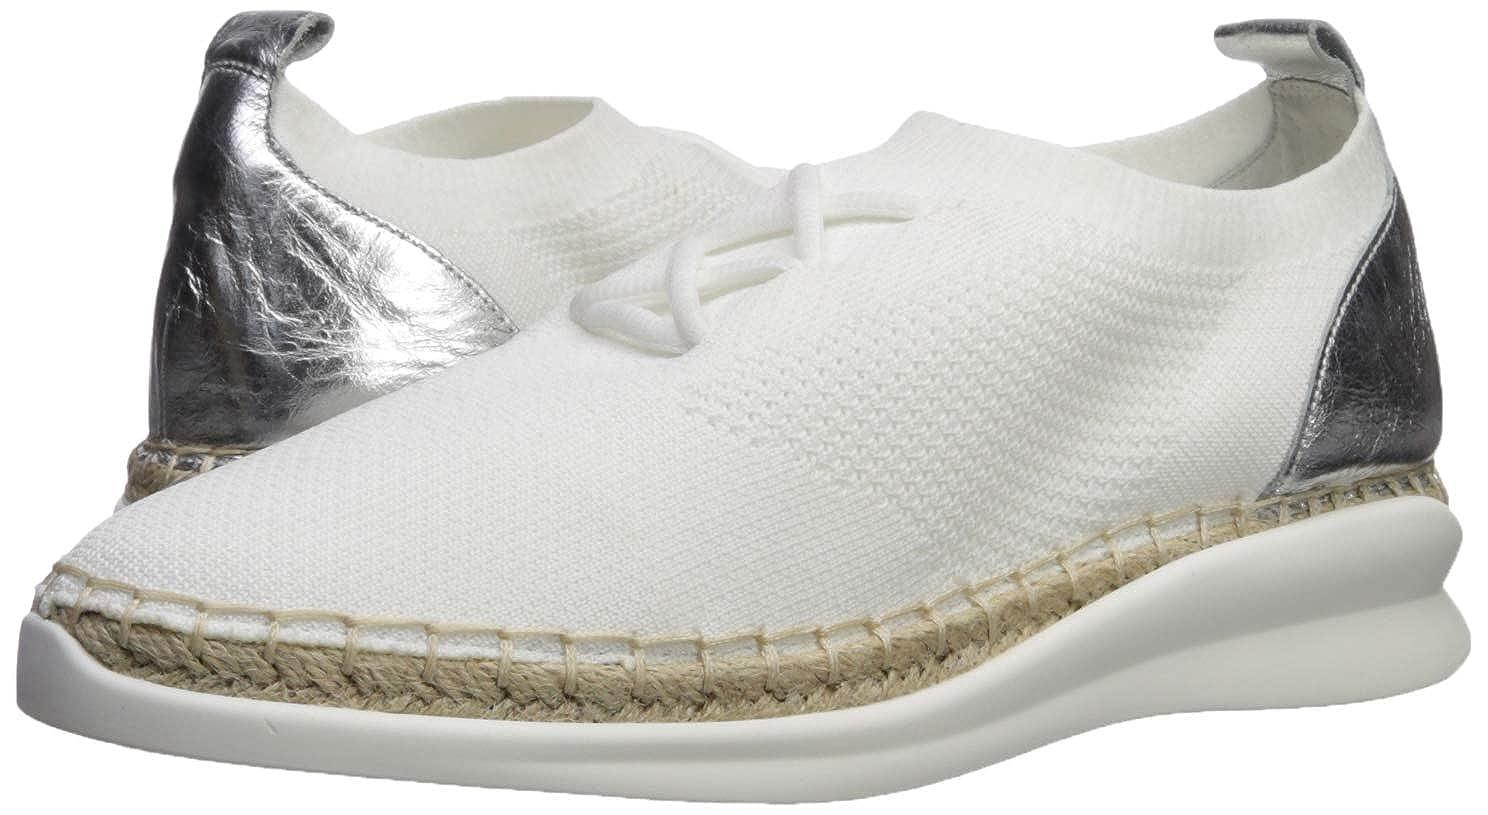 Buy Vince Camuto Women's Affina Sneaker